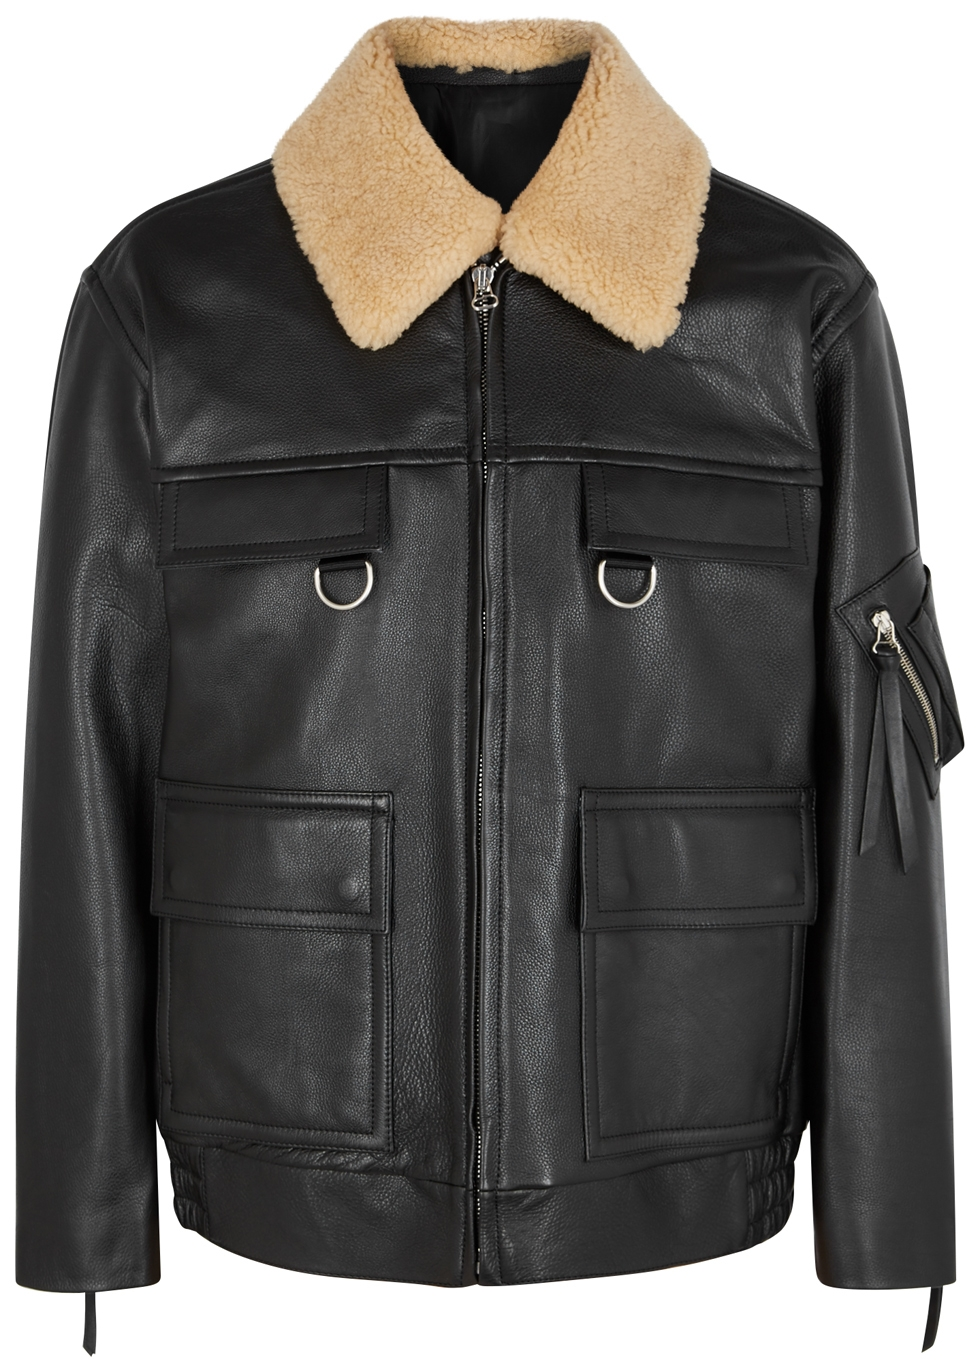 SOLID HOMME Black Shearling-Trimmed Leather Jacket